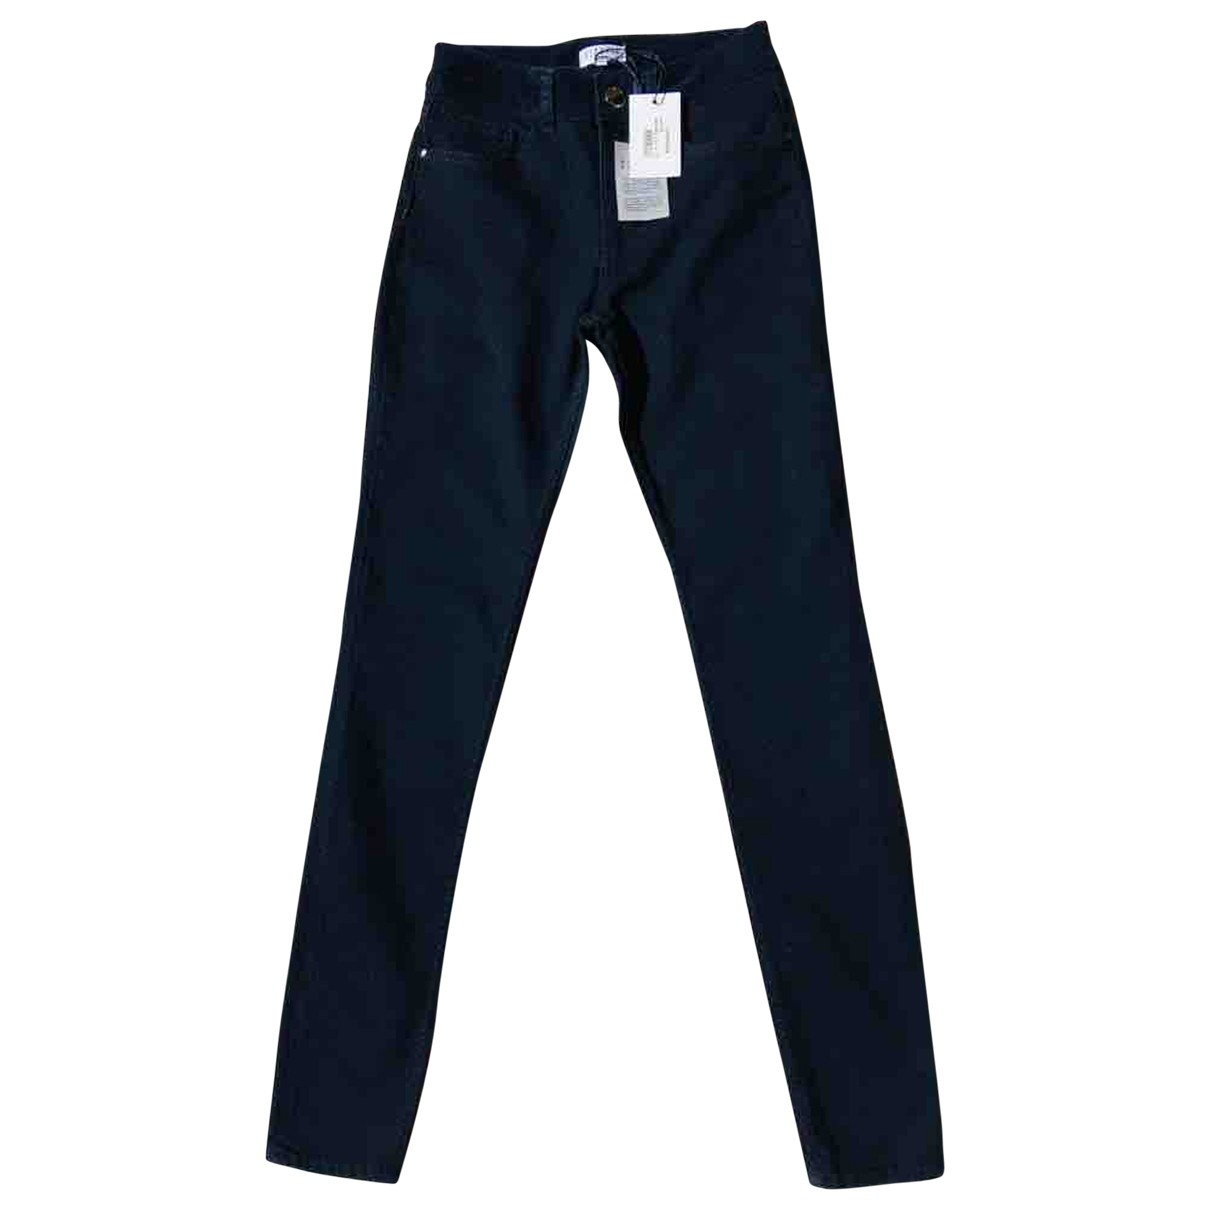 Claudie Pierlot \N Navy Cotton - elasthane Jeans for Women 34 FR